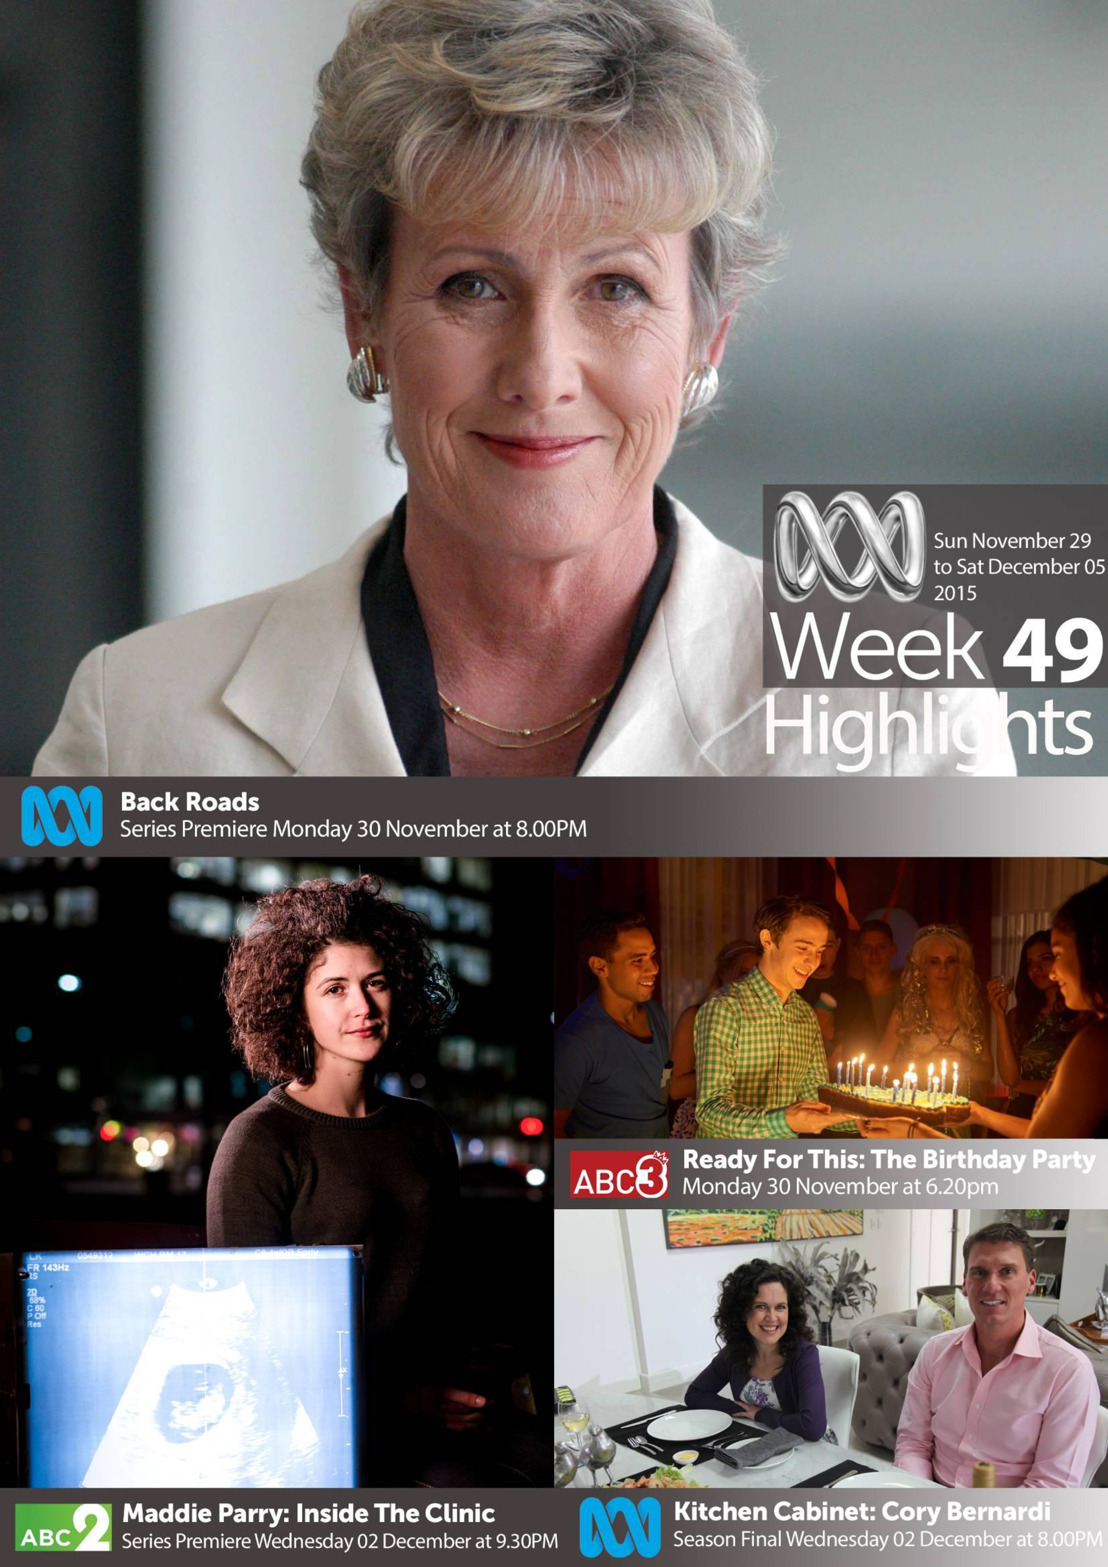 ABC TV Highlights - Week 49